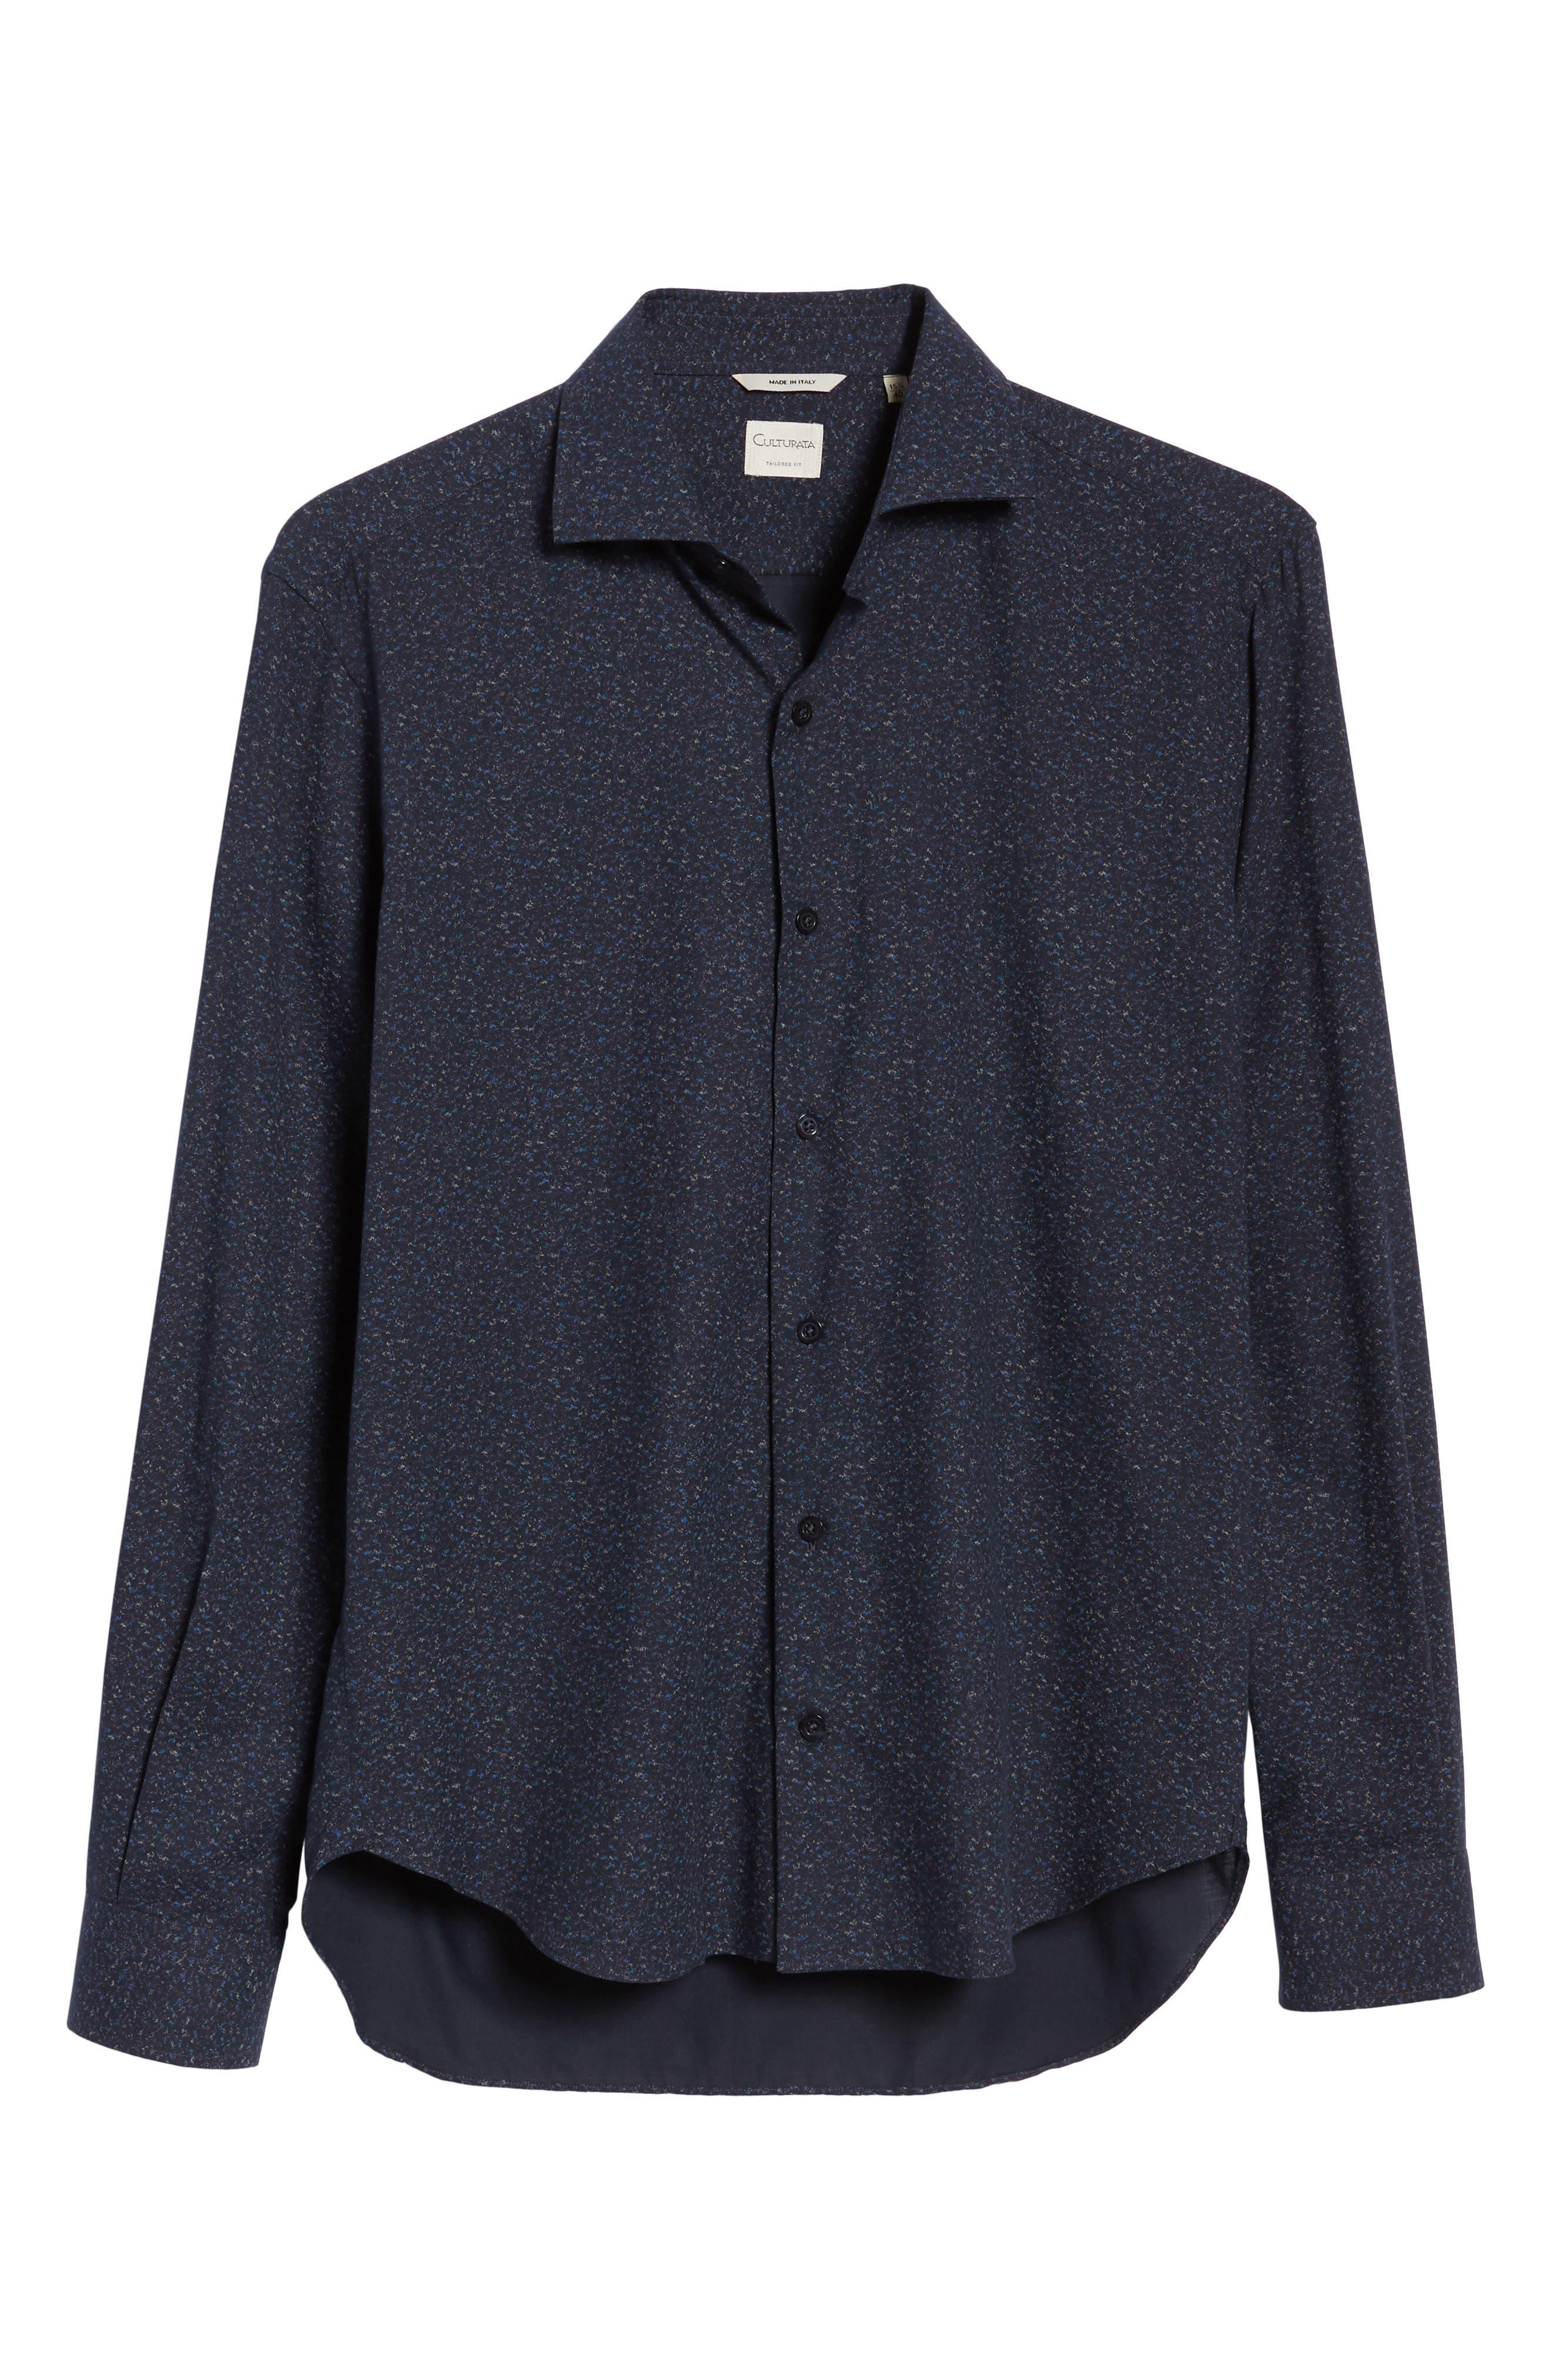 Speckled Sport Shirt,                             Alternate thumbnail 6, color,                             Navy